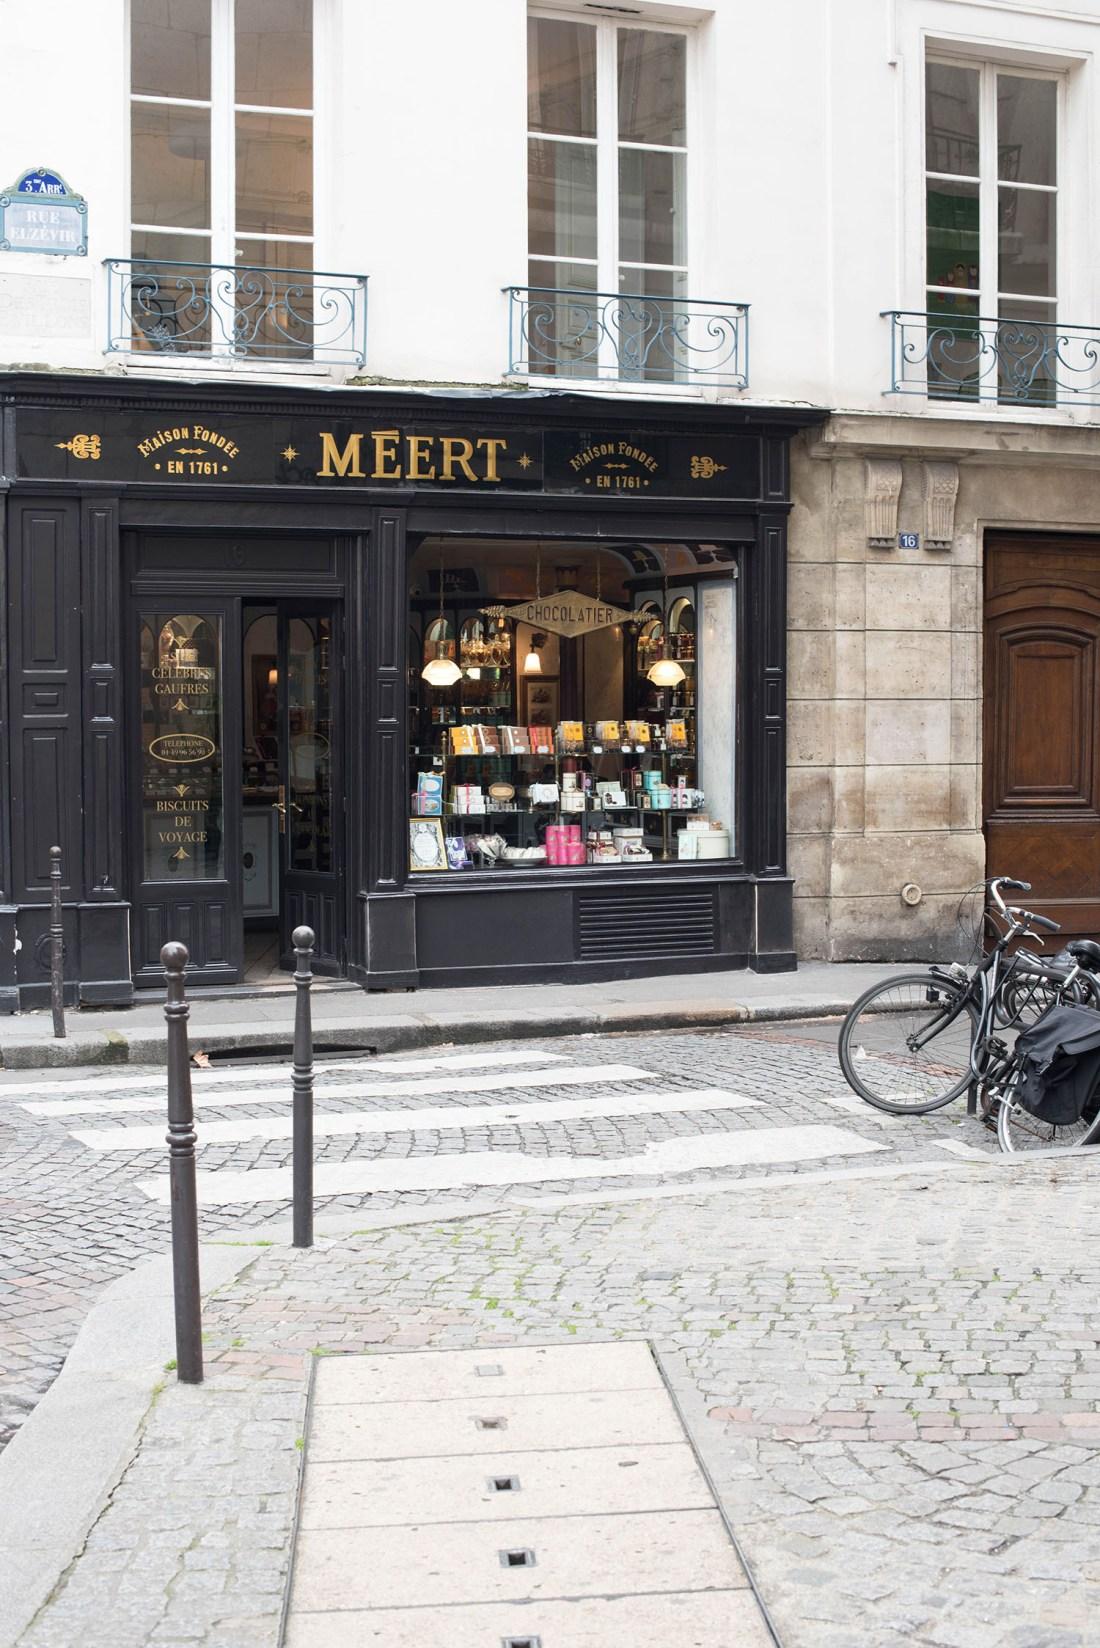 The black facade of Meert in le Marais in Paris, captured by Winnipeg travel blogger Cee Fardoe of Coco & Vera